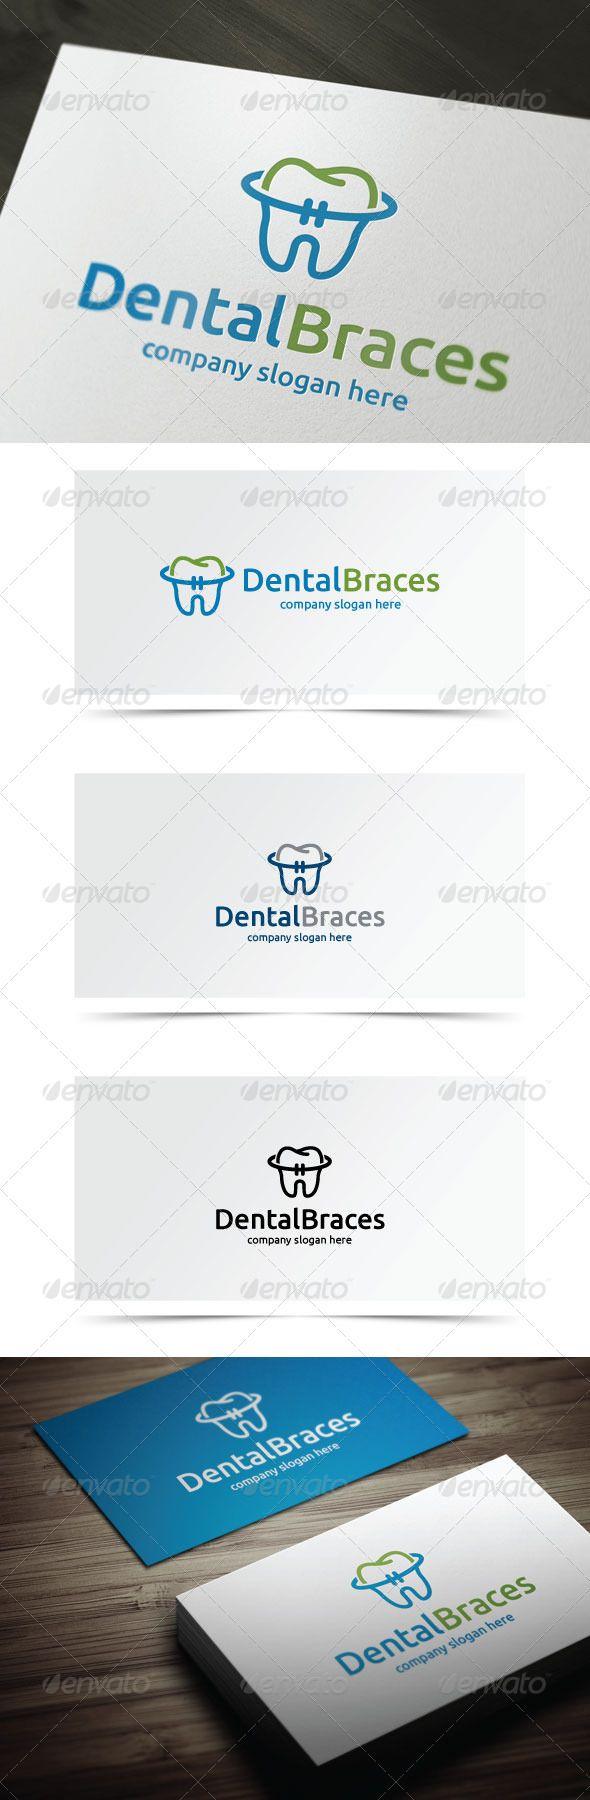 Dental Braces - Objects Logo Templates